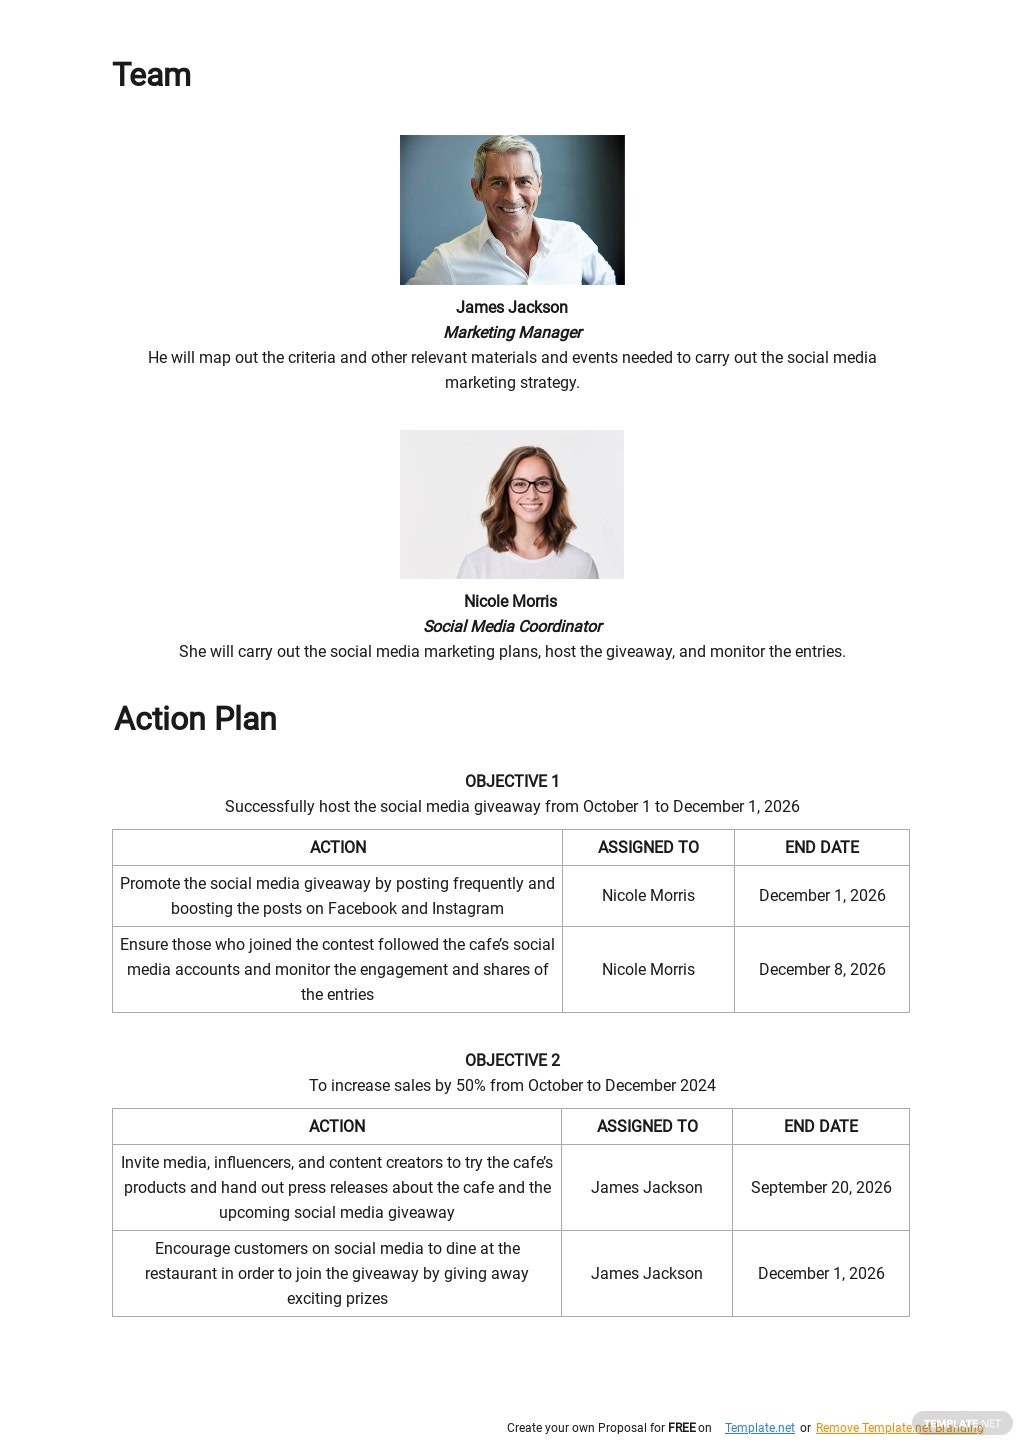 Strategic Social Media Marketing Plan Template 2.jpe